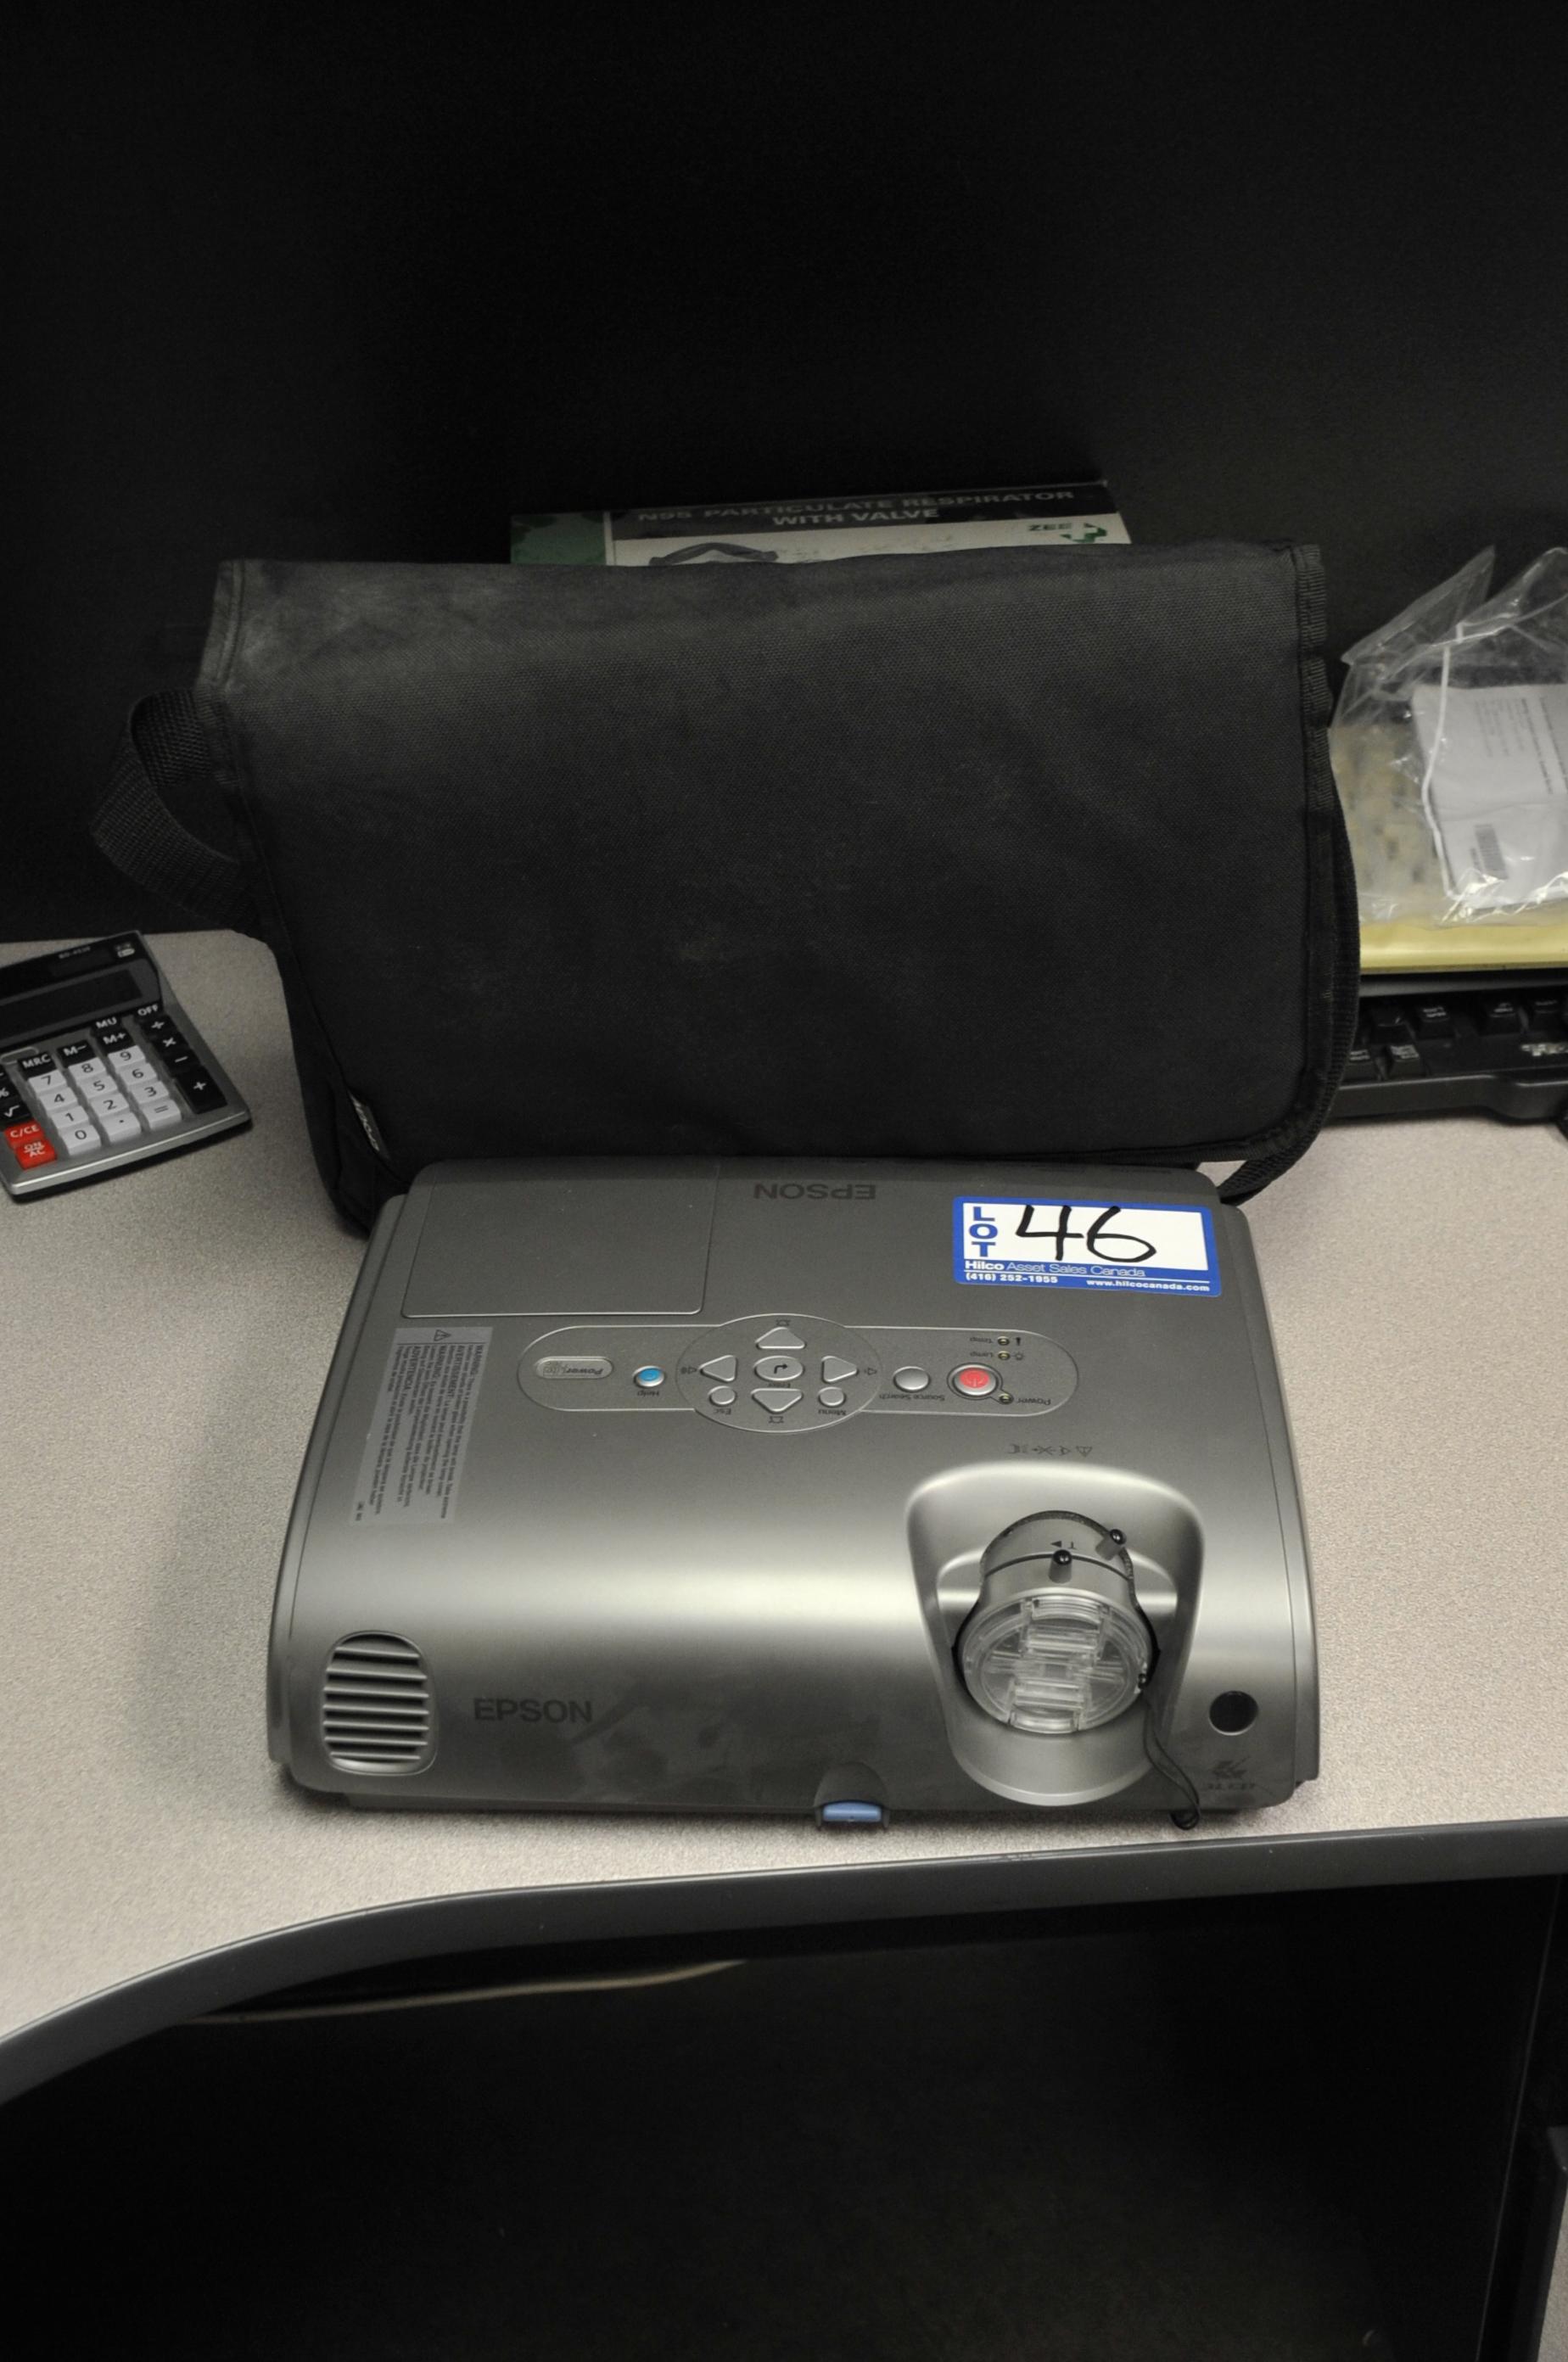 Epson Model 3 LCD Projector